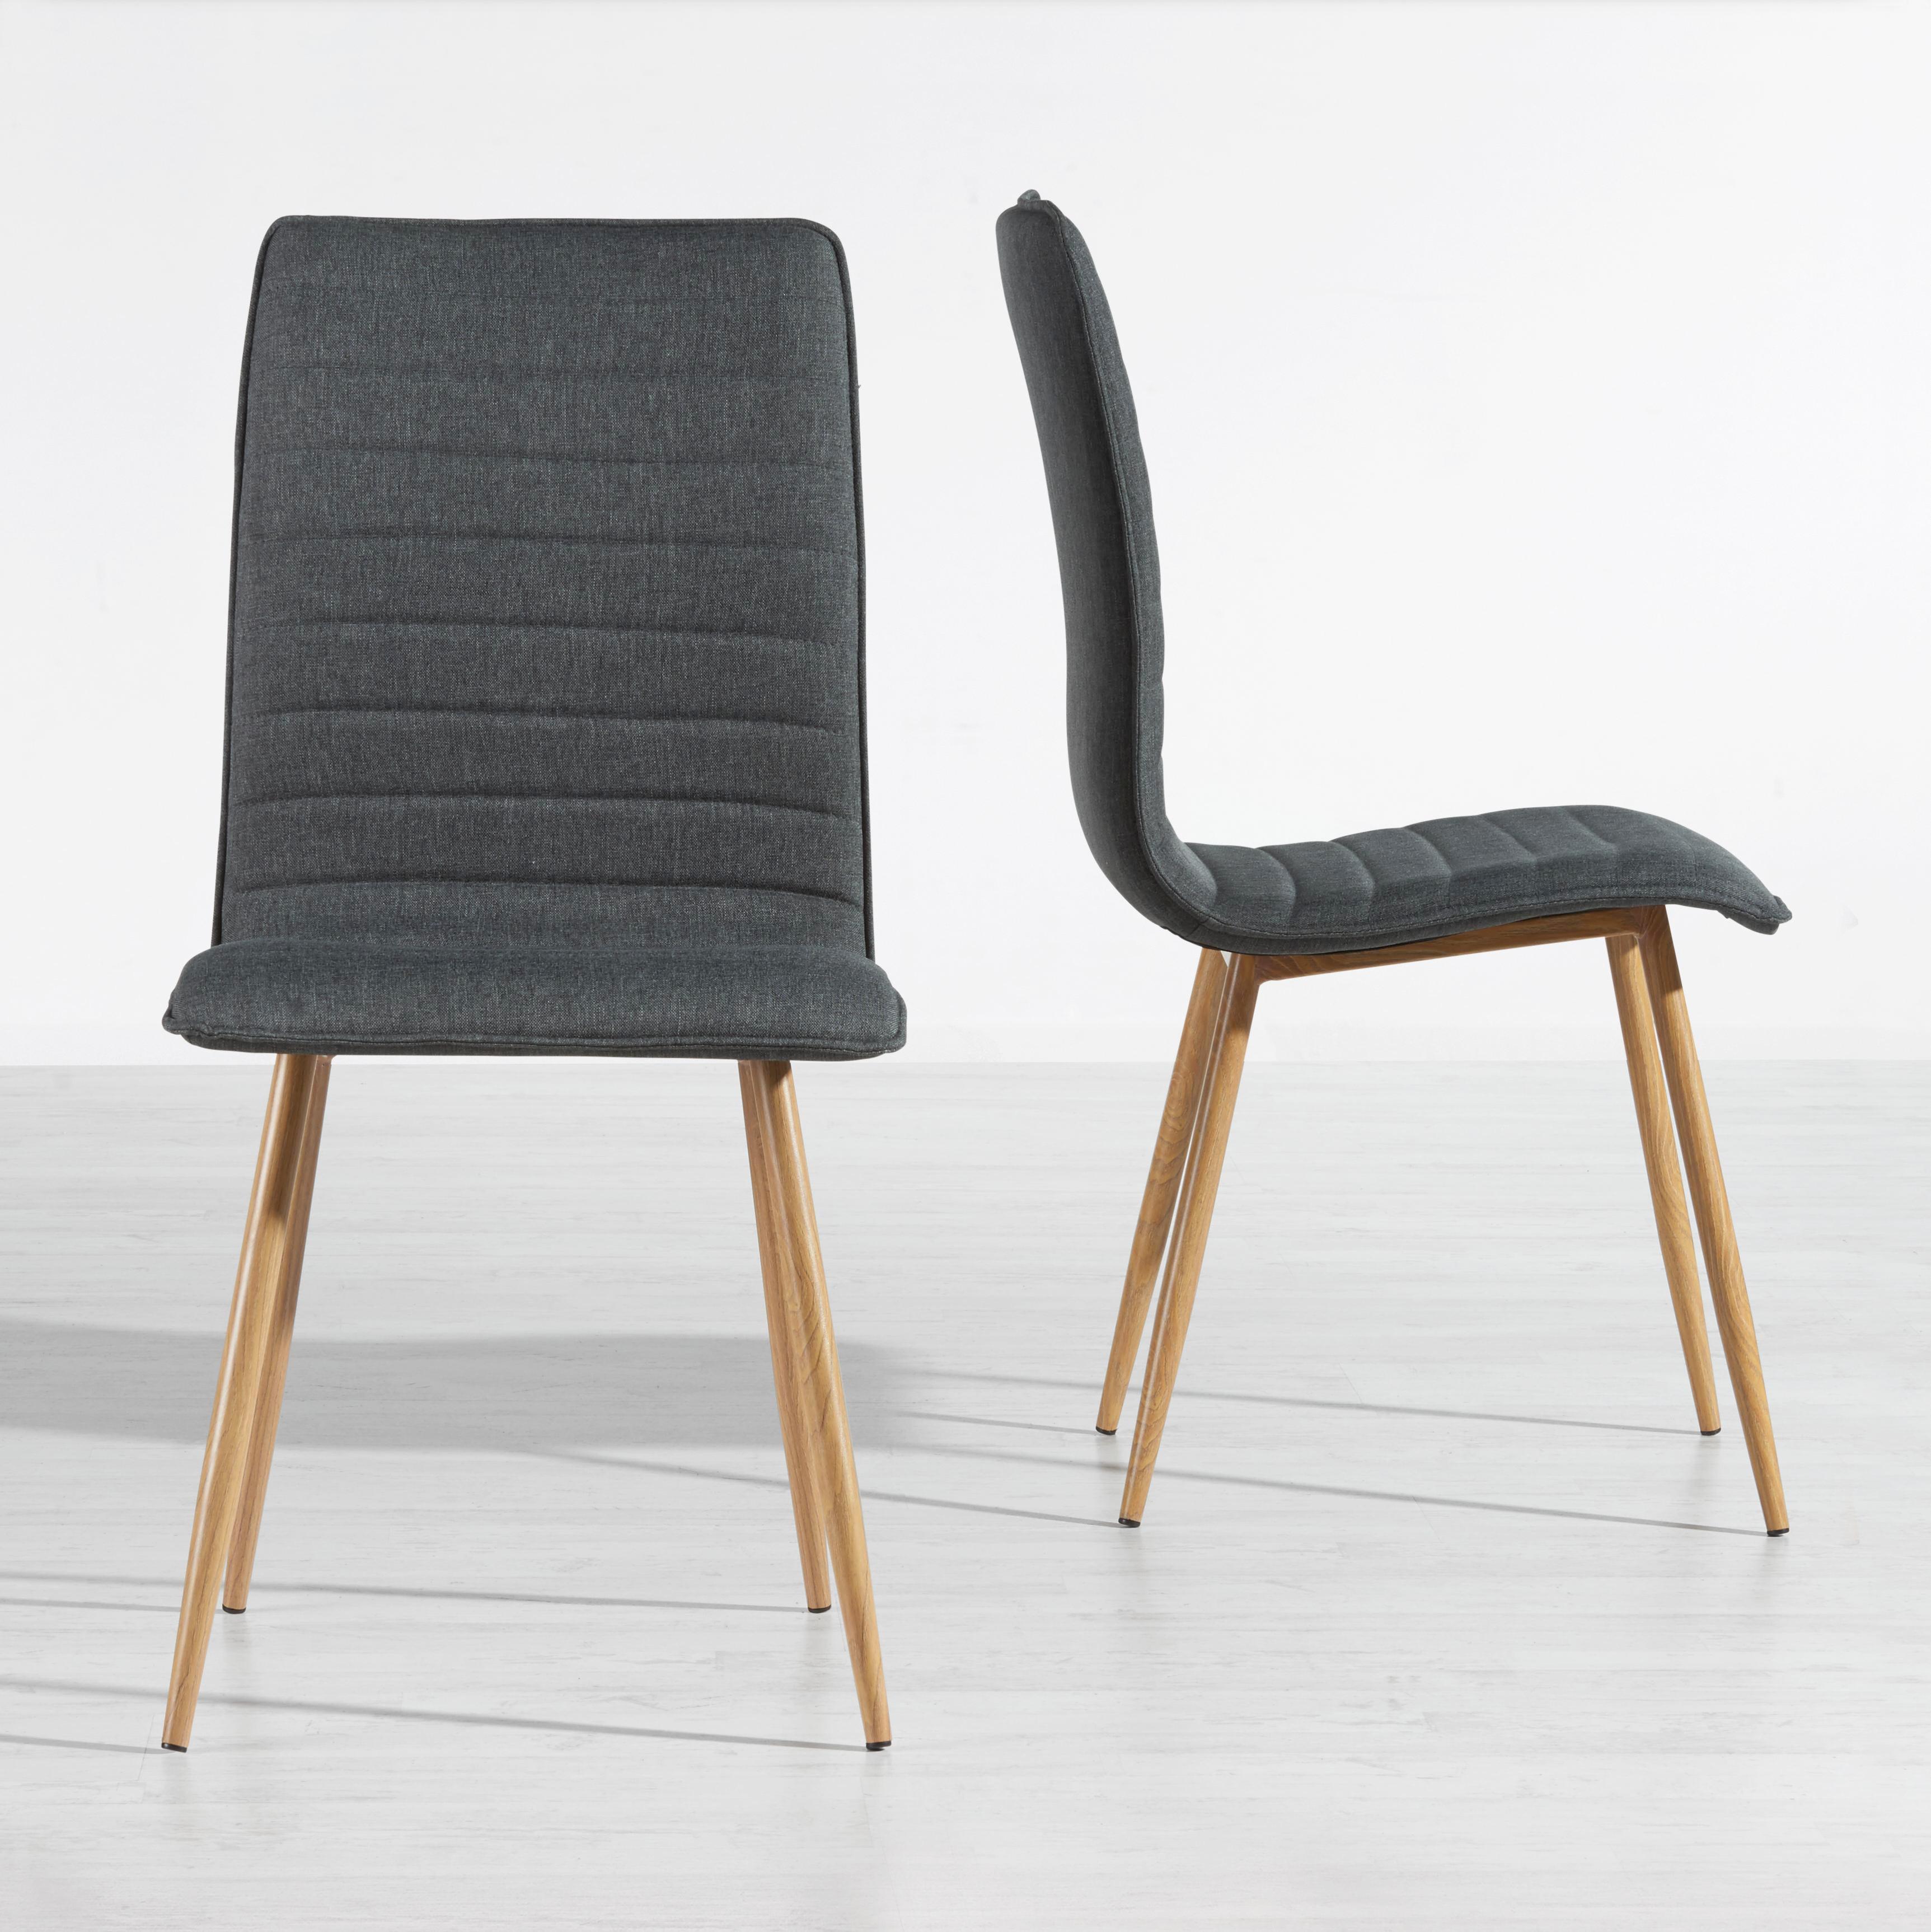 Stuhl Milena - Dunkelgrau, MODERN, Kunststoff/Textil (45/91/56,5cm) - MÖMAX modern living